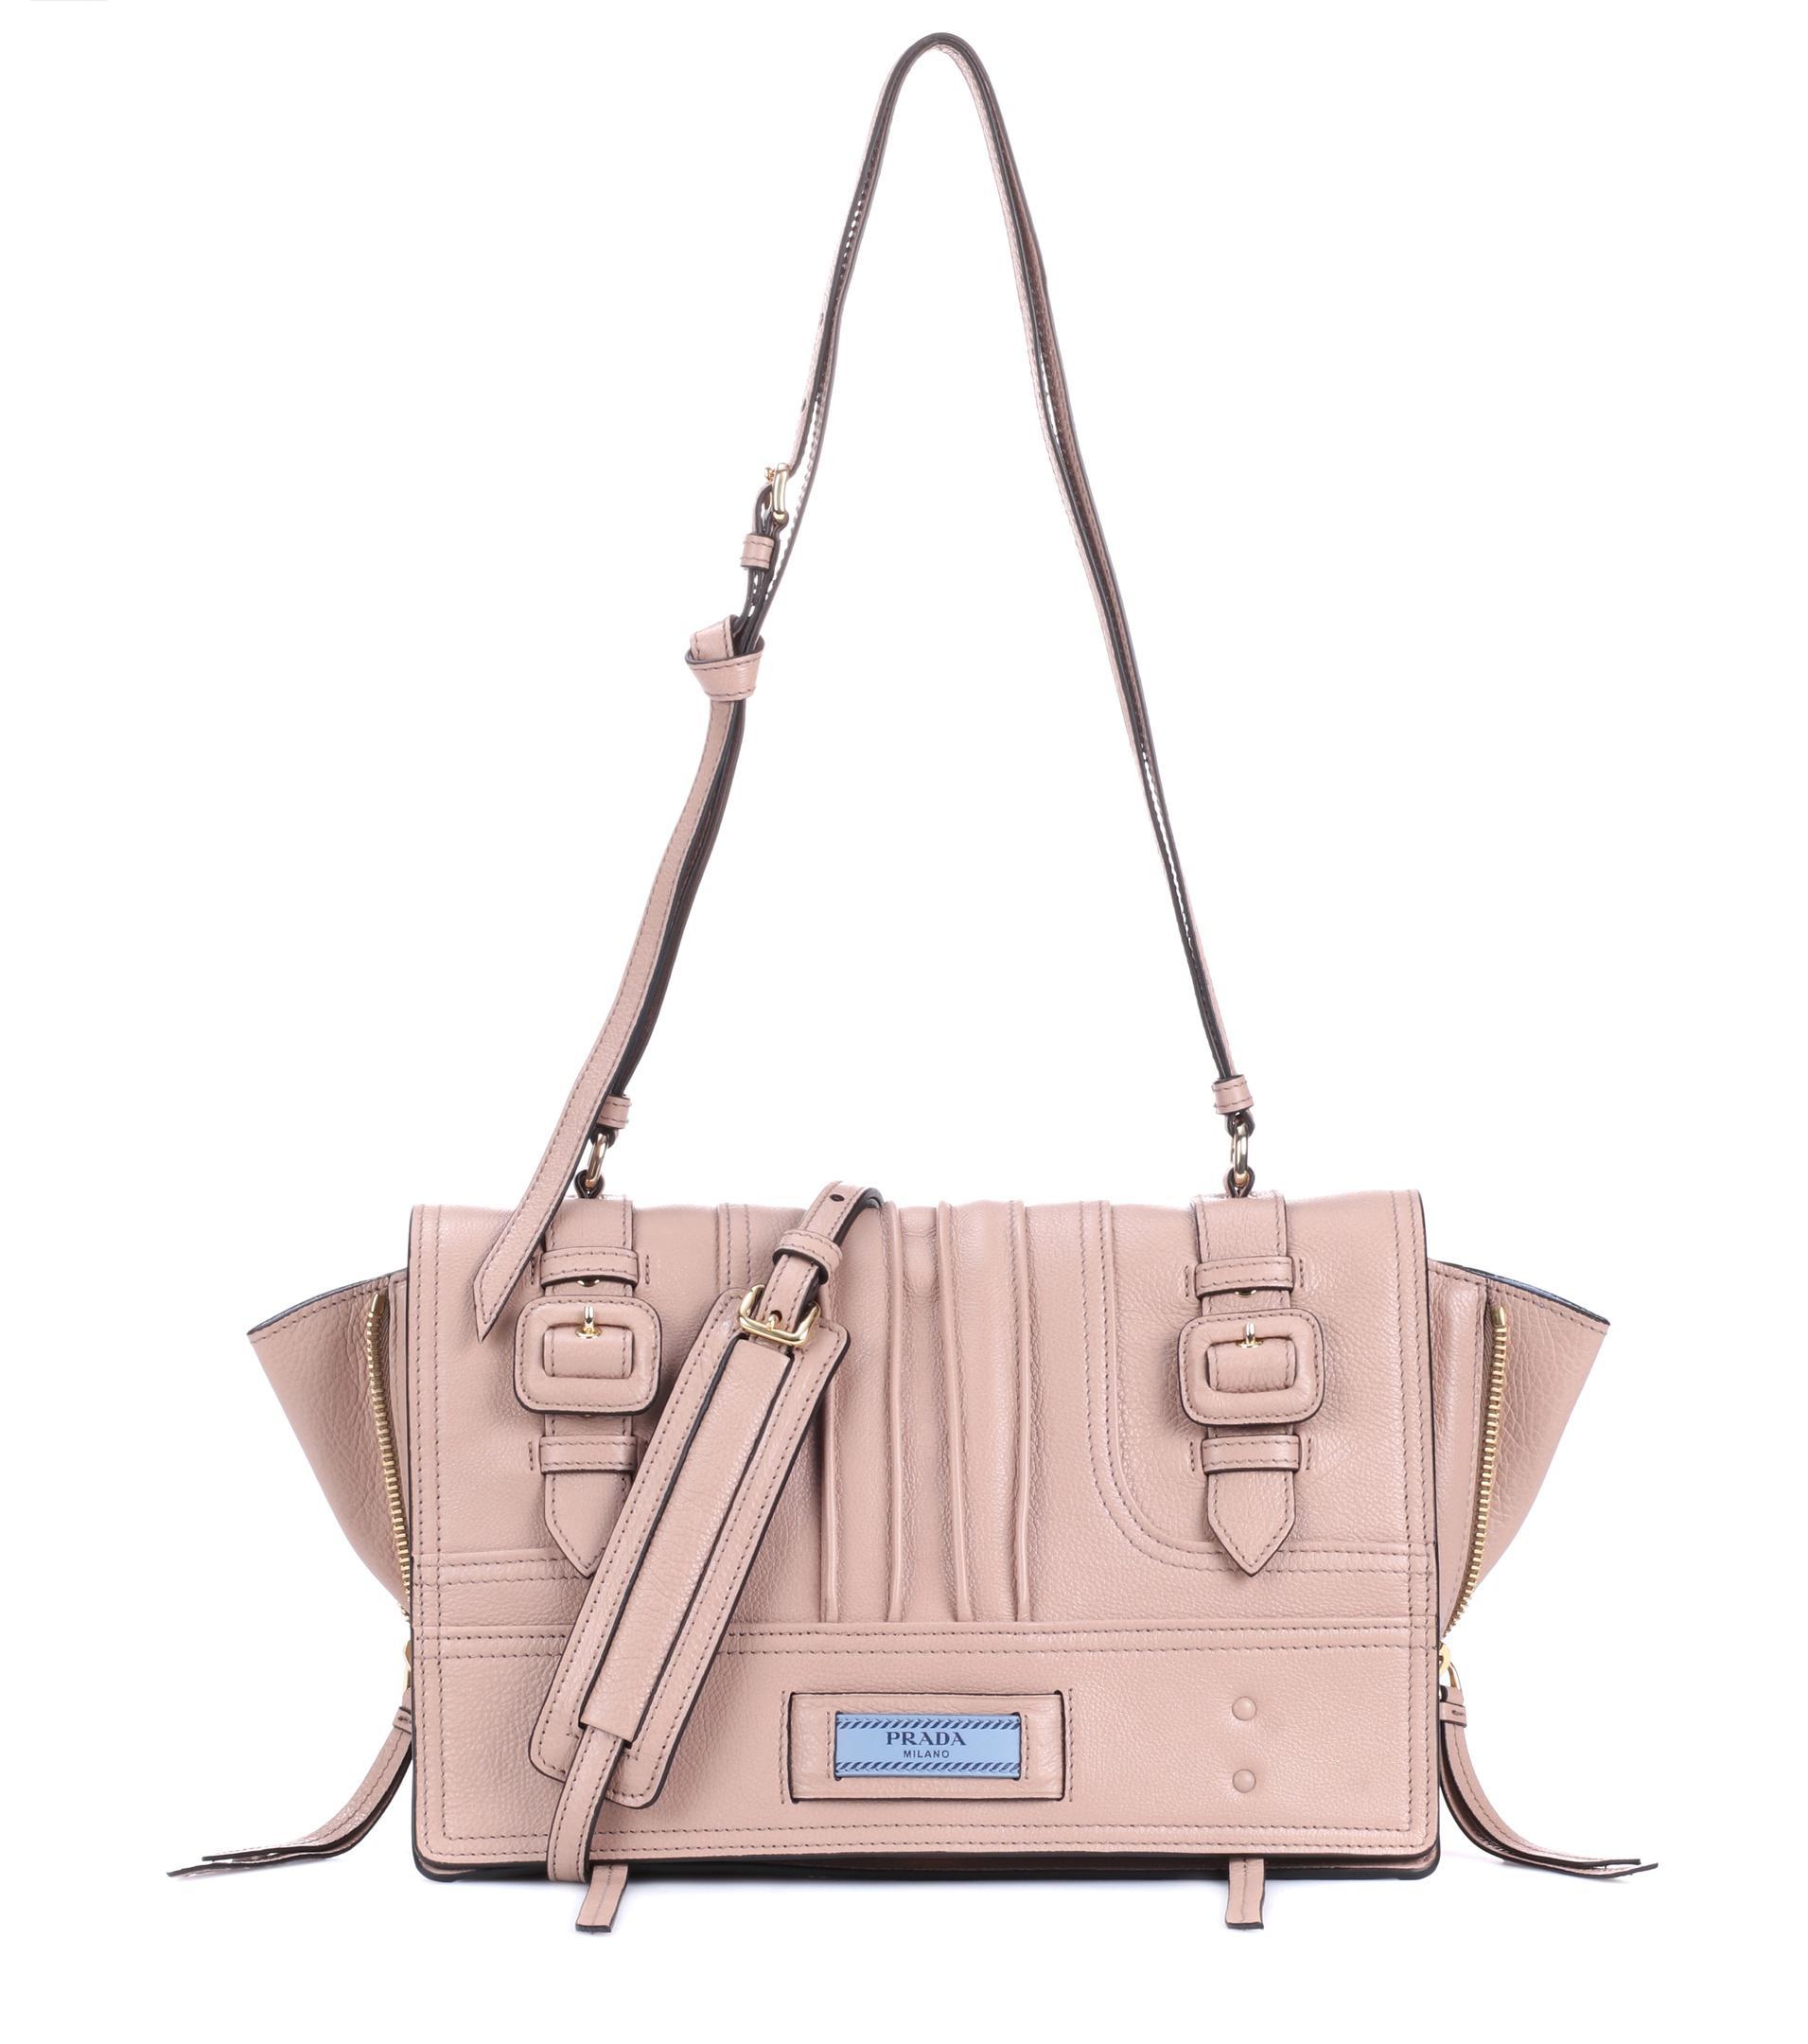 a210e8c55082 Prada Etiquette Leather Shoulder Bag in Pink - Lyst